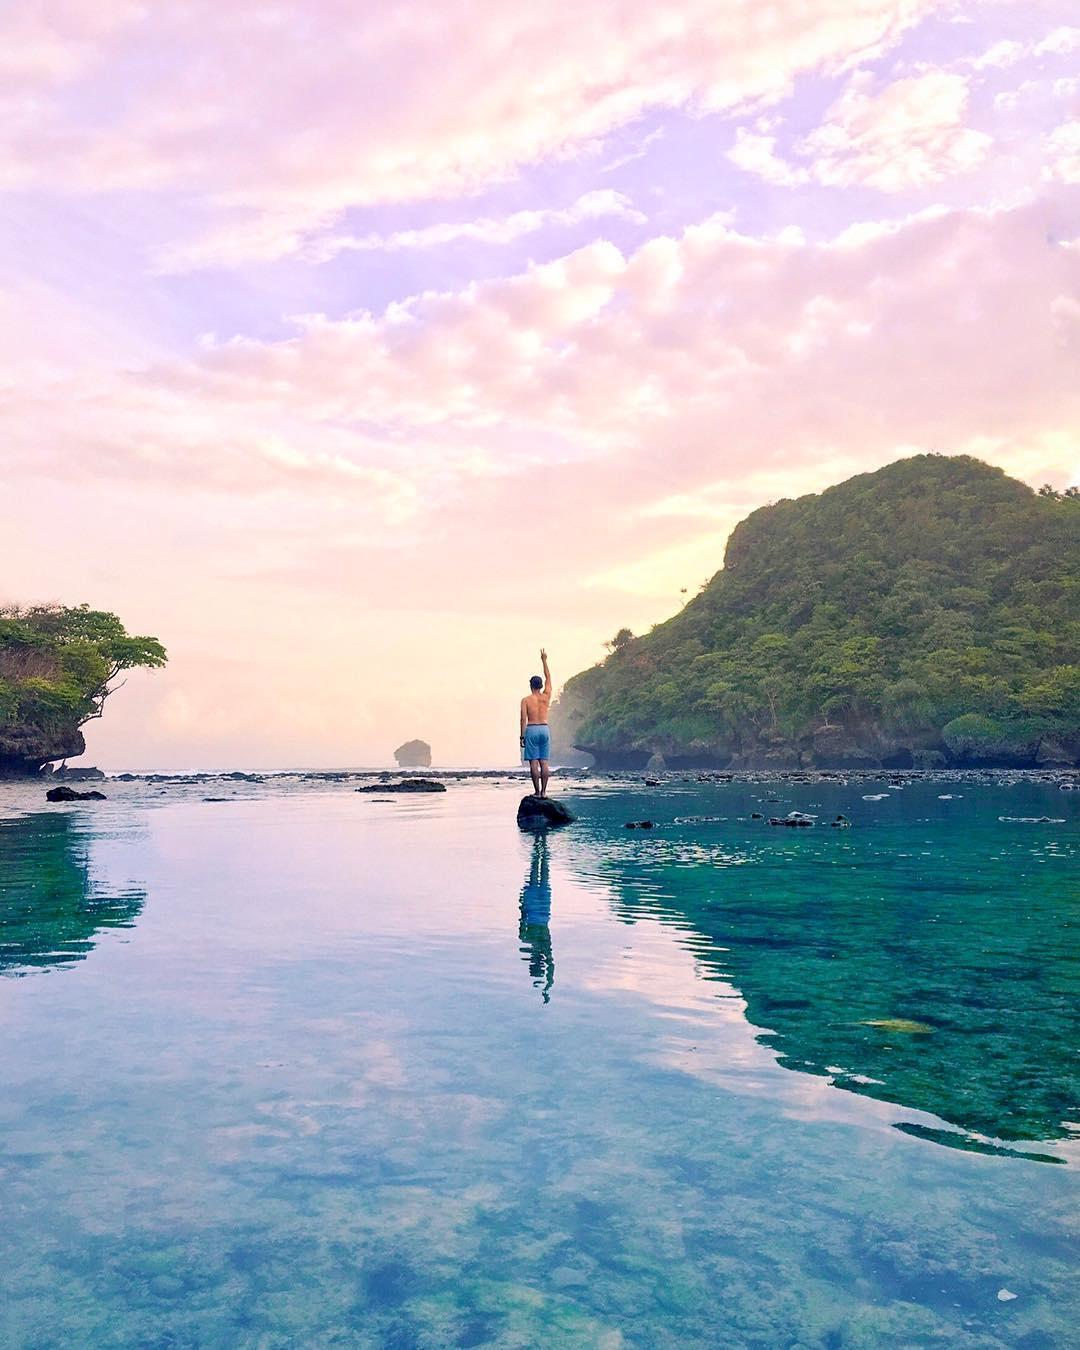 Terbukti Keren, 10 Wisata Malang Ini Bikin Feeds Instagram Makin Kece